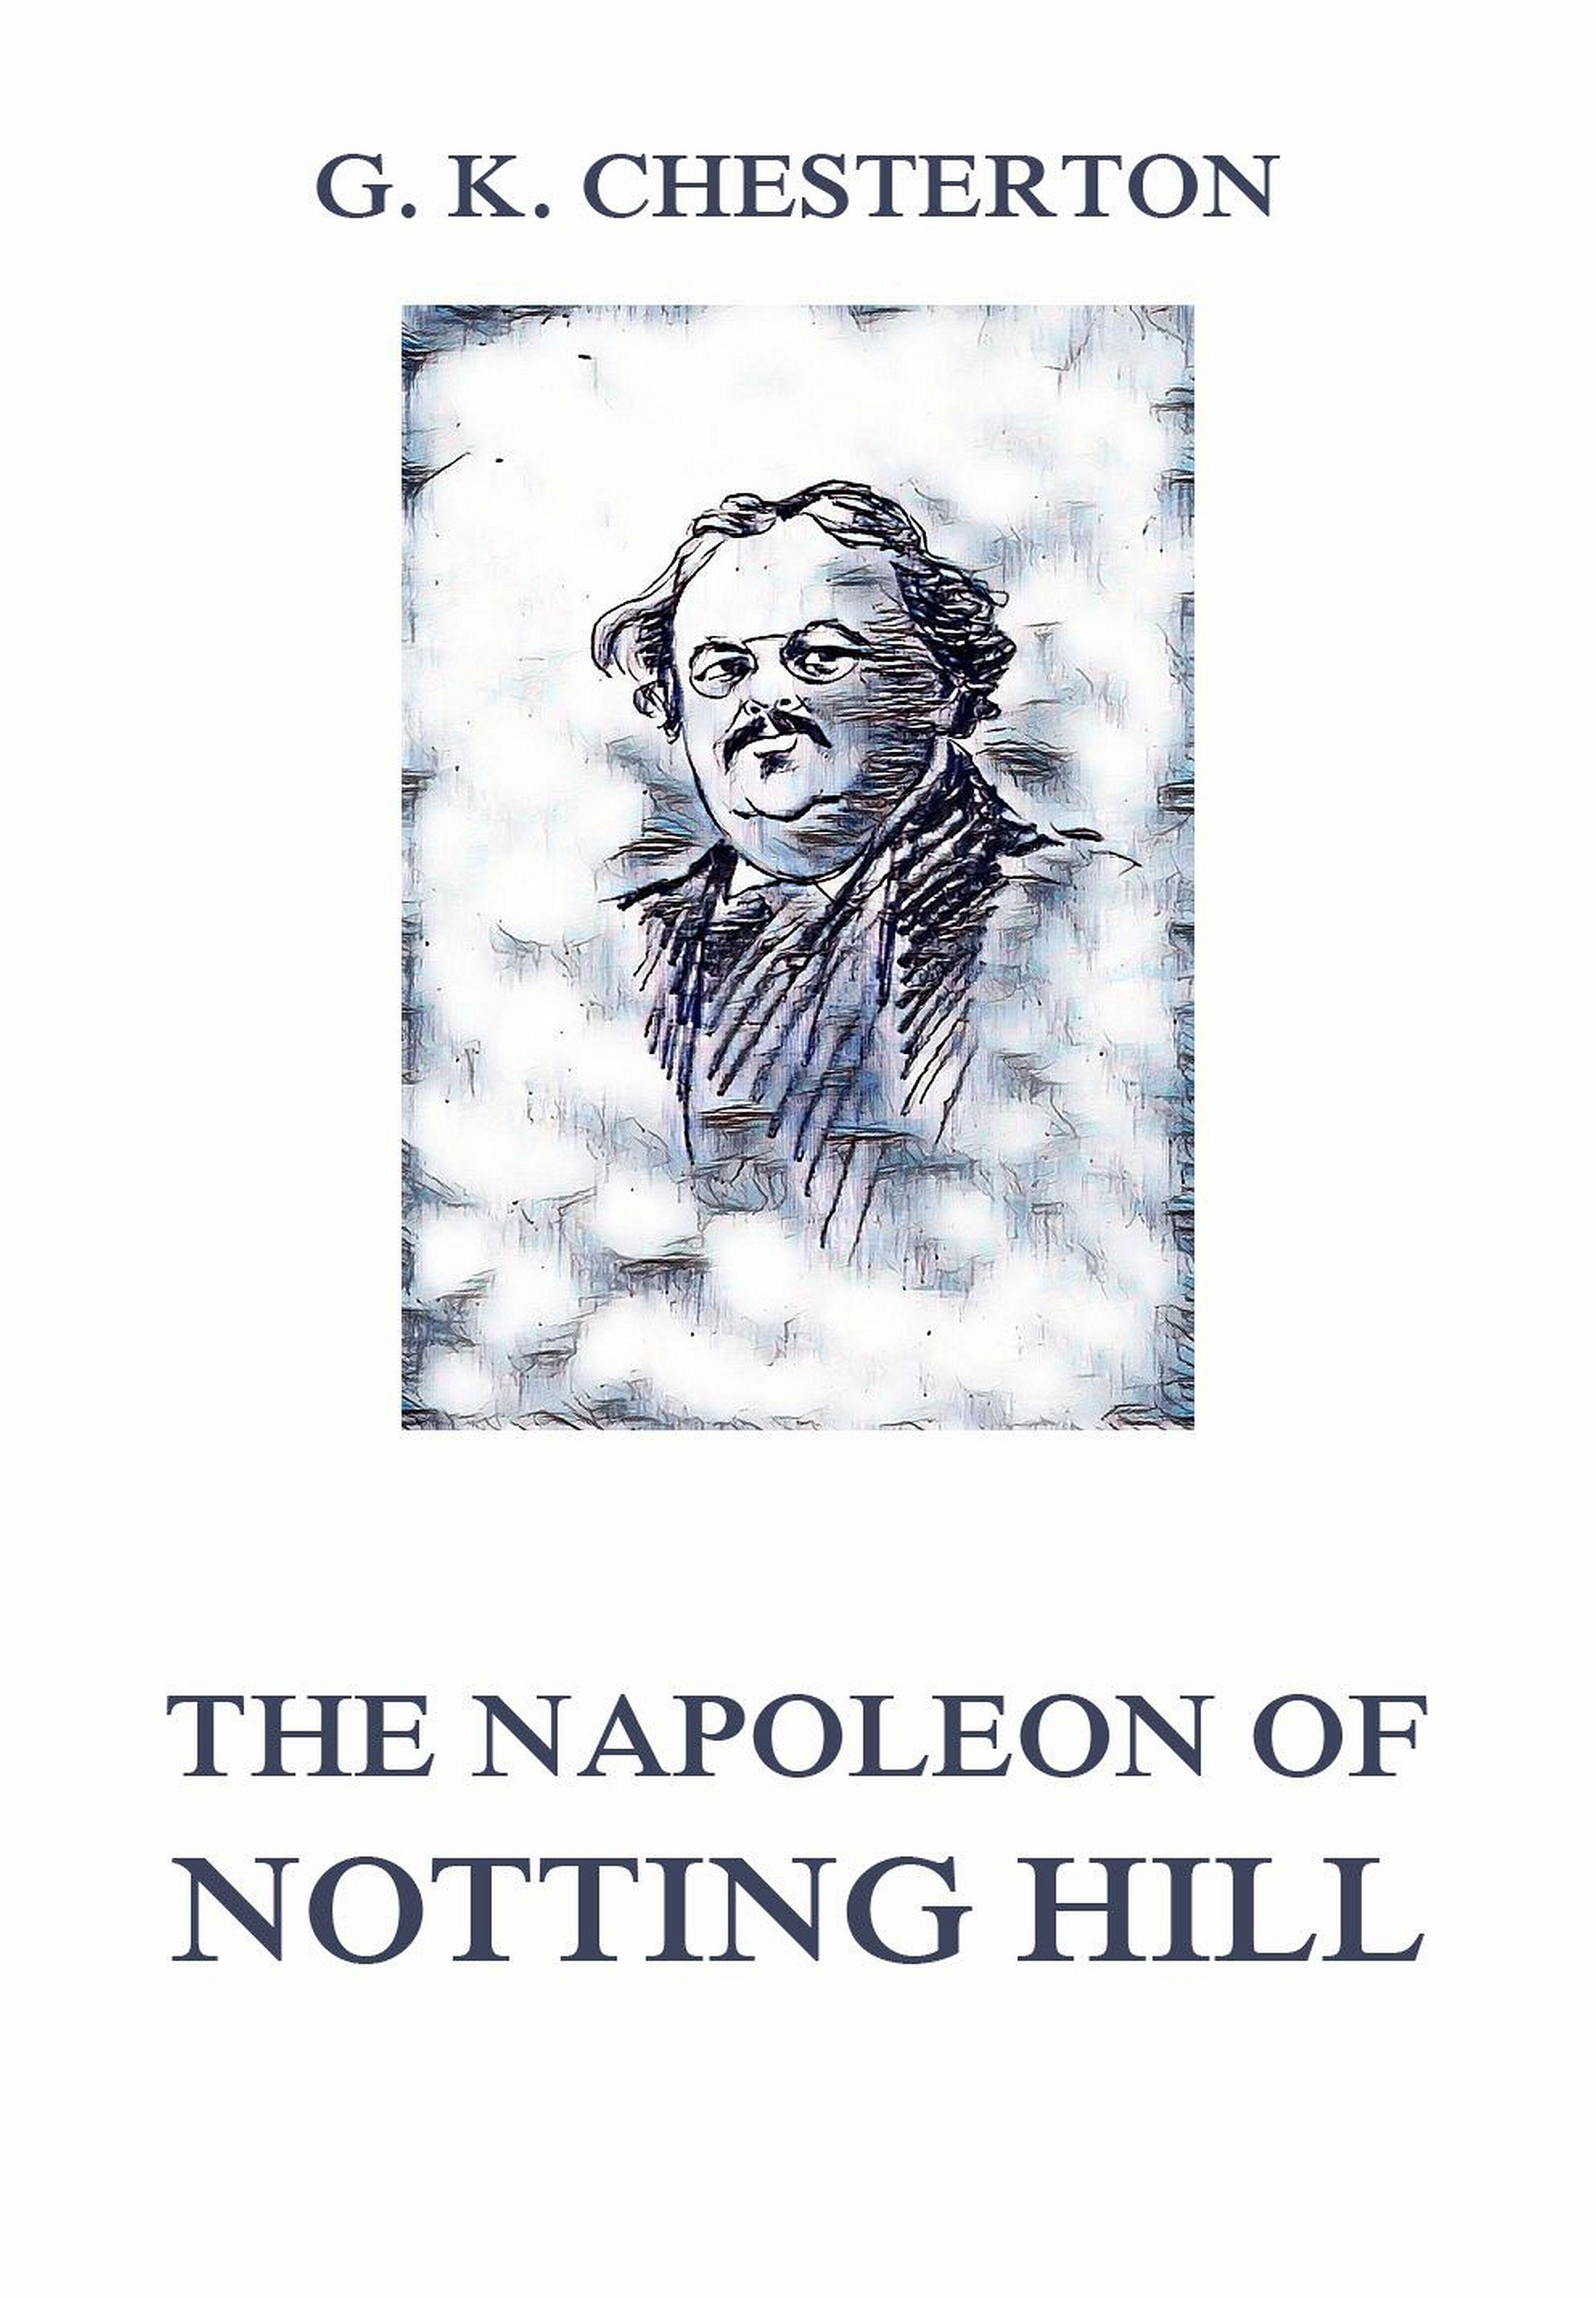 Гилберт Кит Честертон The Napoleon of Notting Hill g k chesterton the napoleon of notting hill